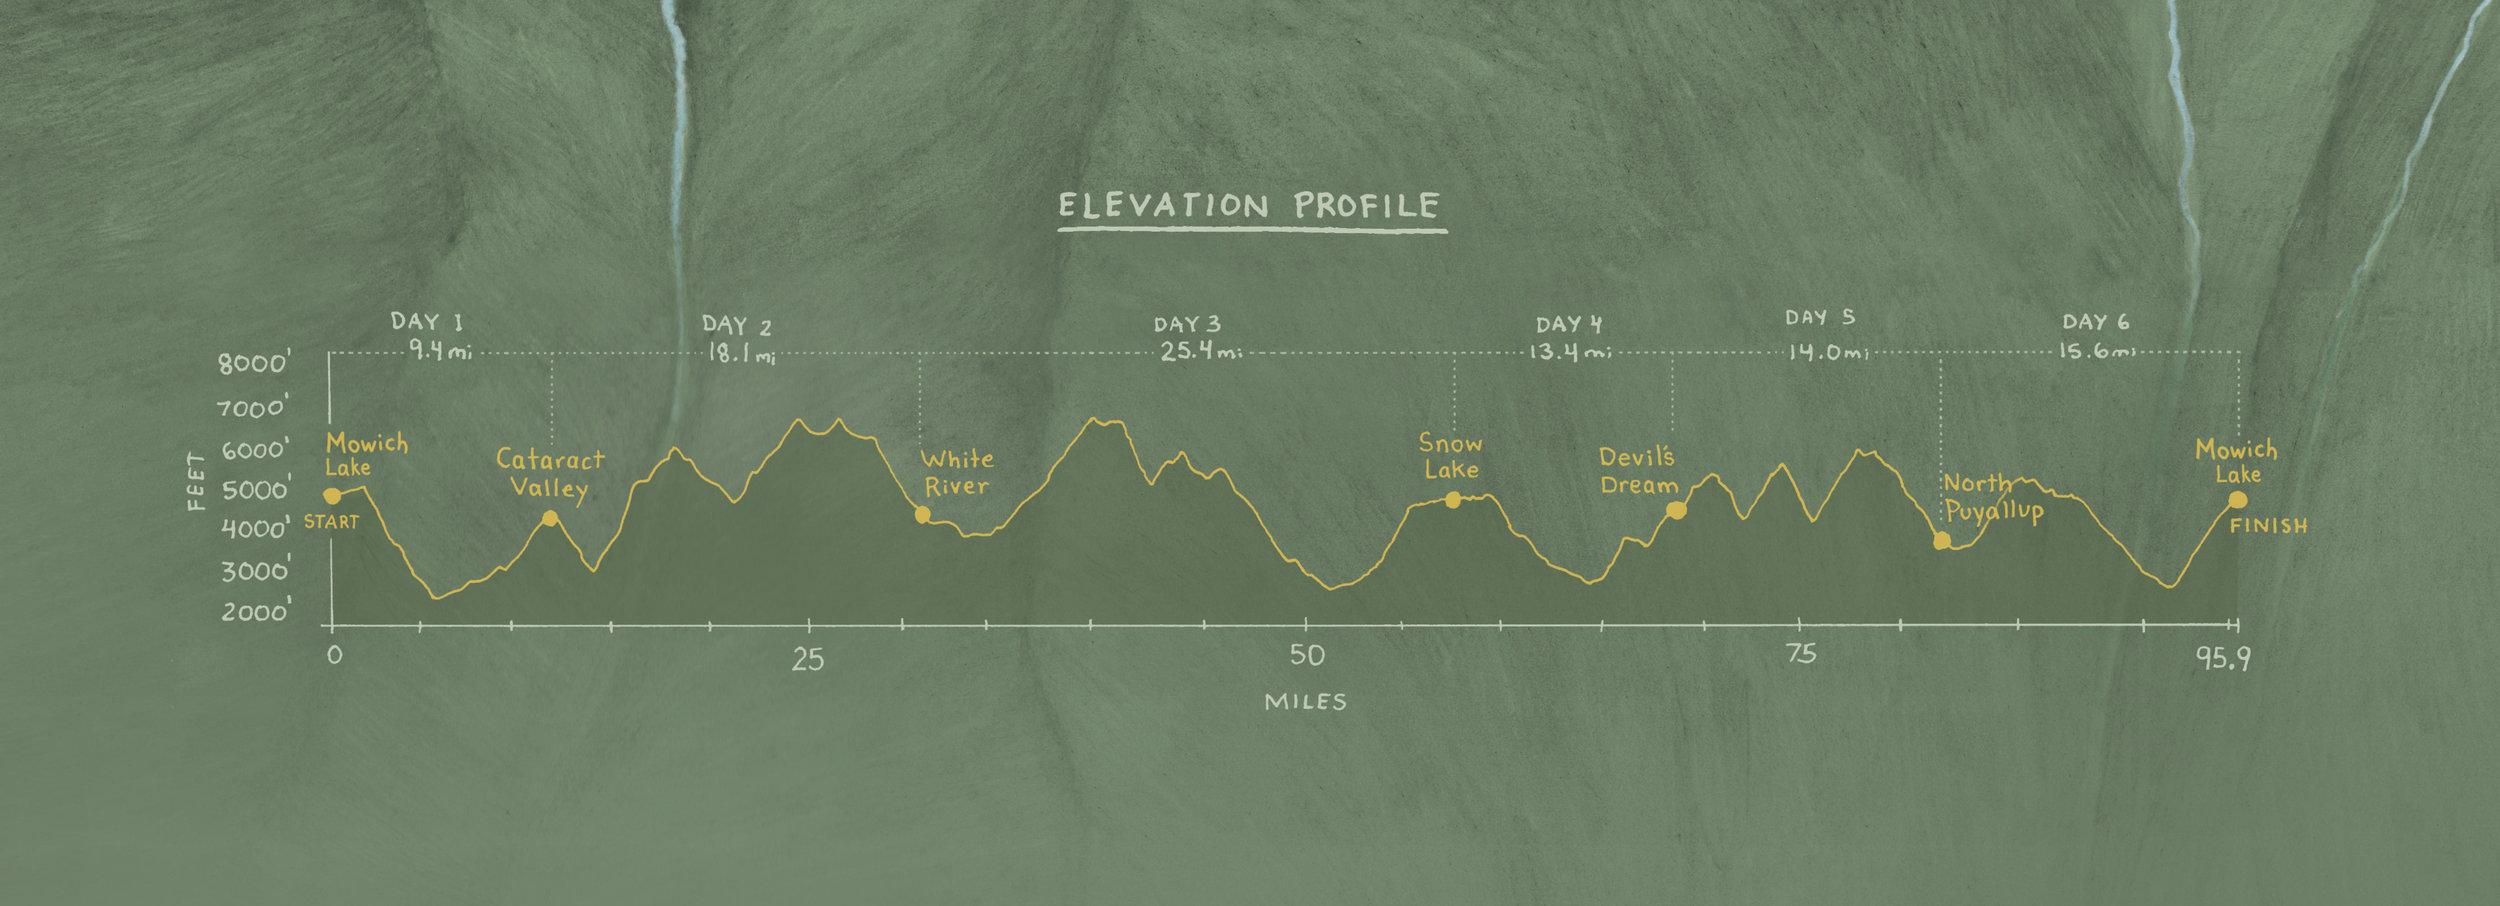 MtRaininer_WT_v5_flattened_elevationprofile.jpg